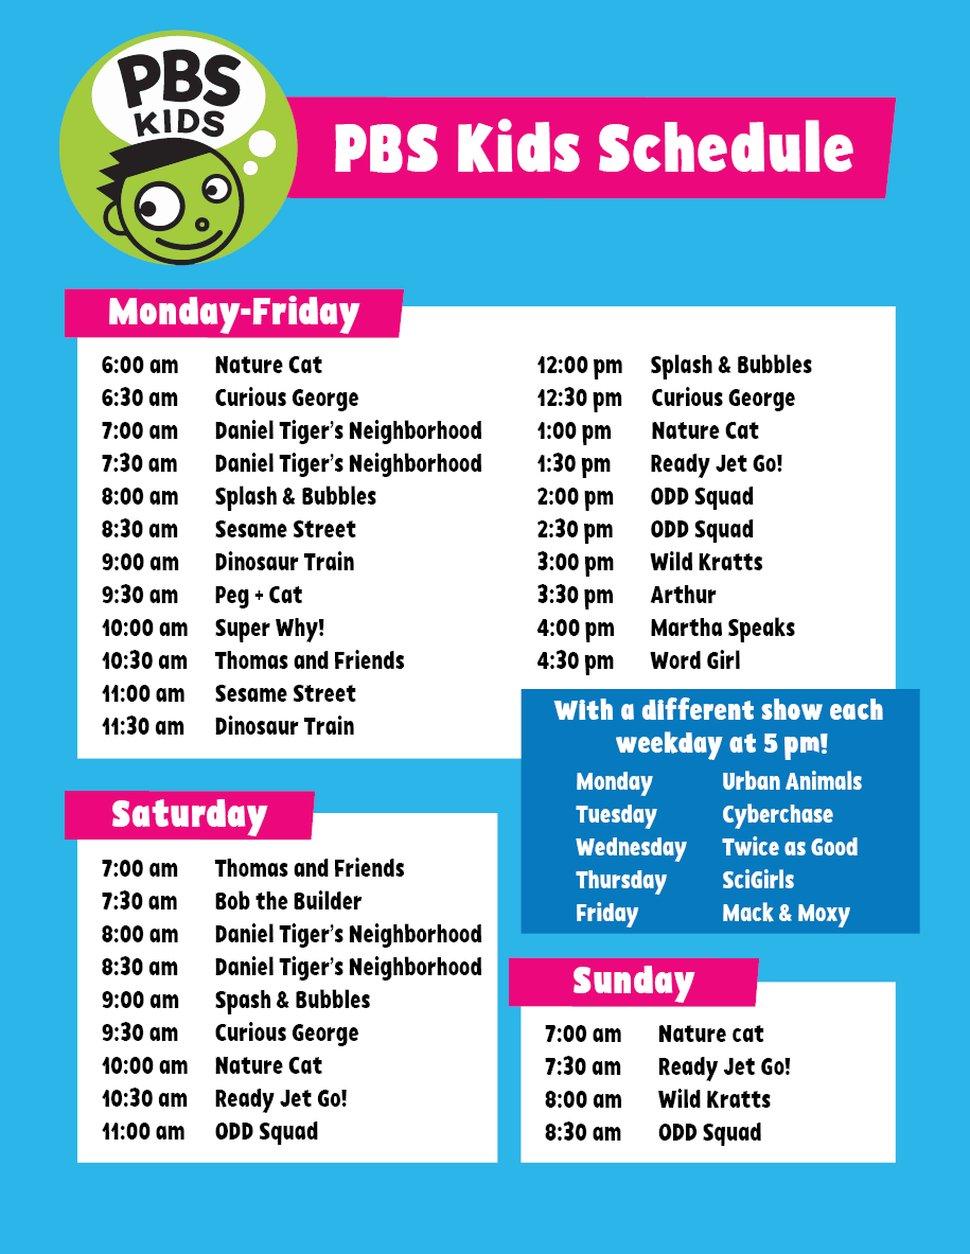 PBS KIDS Schedule Update Feb 2017.png